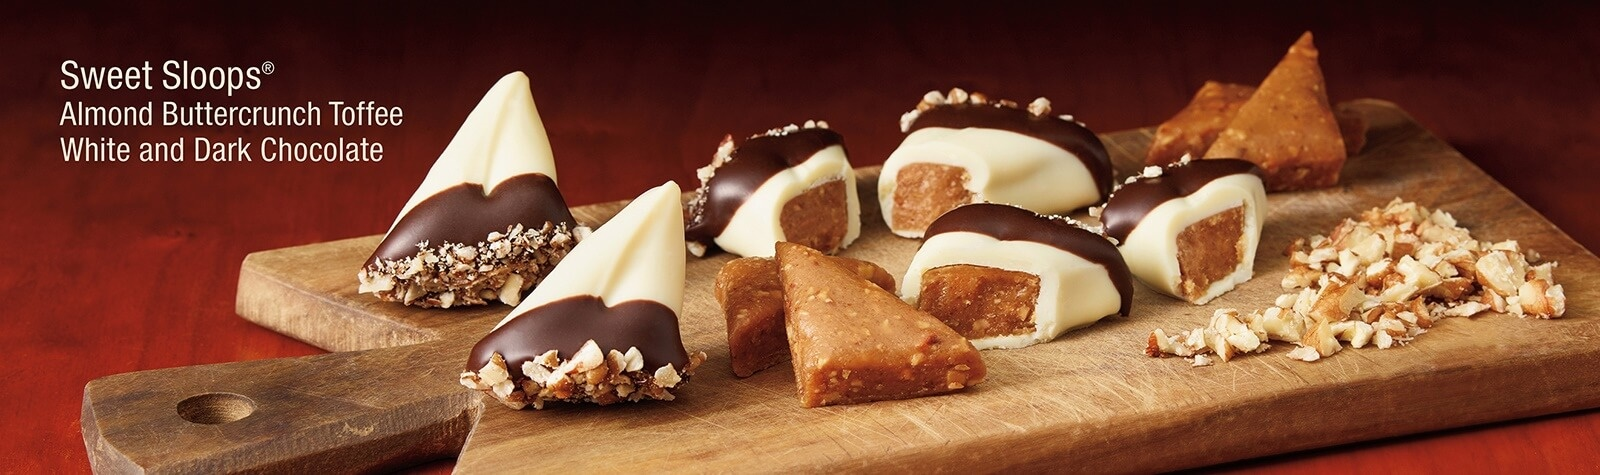 Cocoa Sante Tins - Harbor Sweets